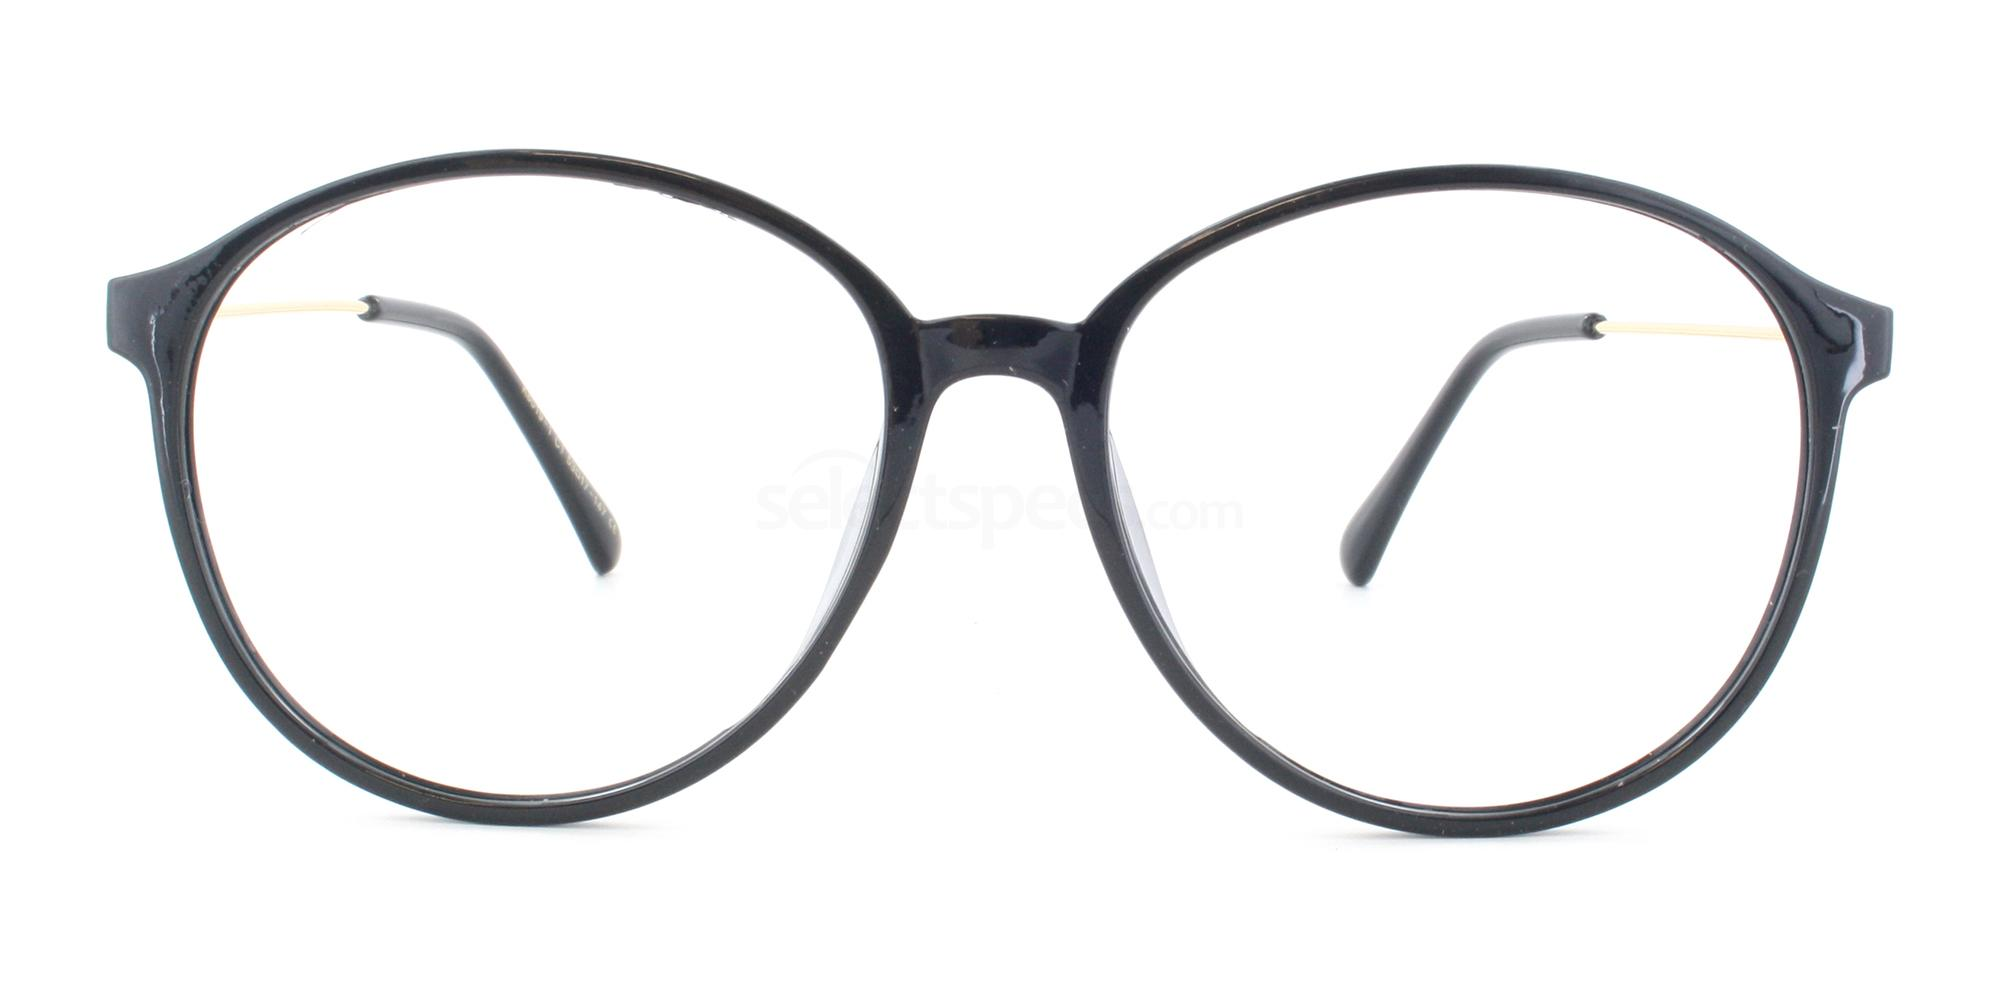 C1 K8019-1 Glasses, Infinity